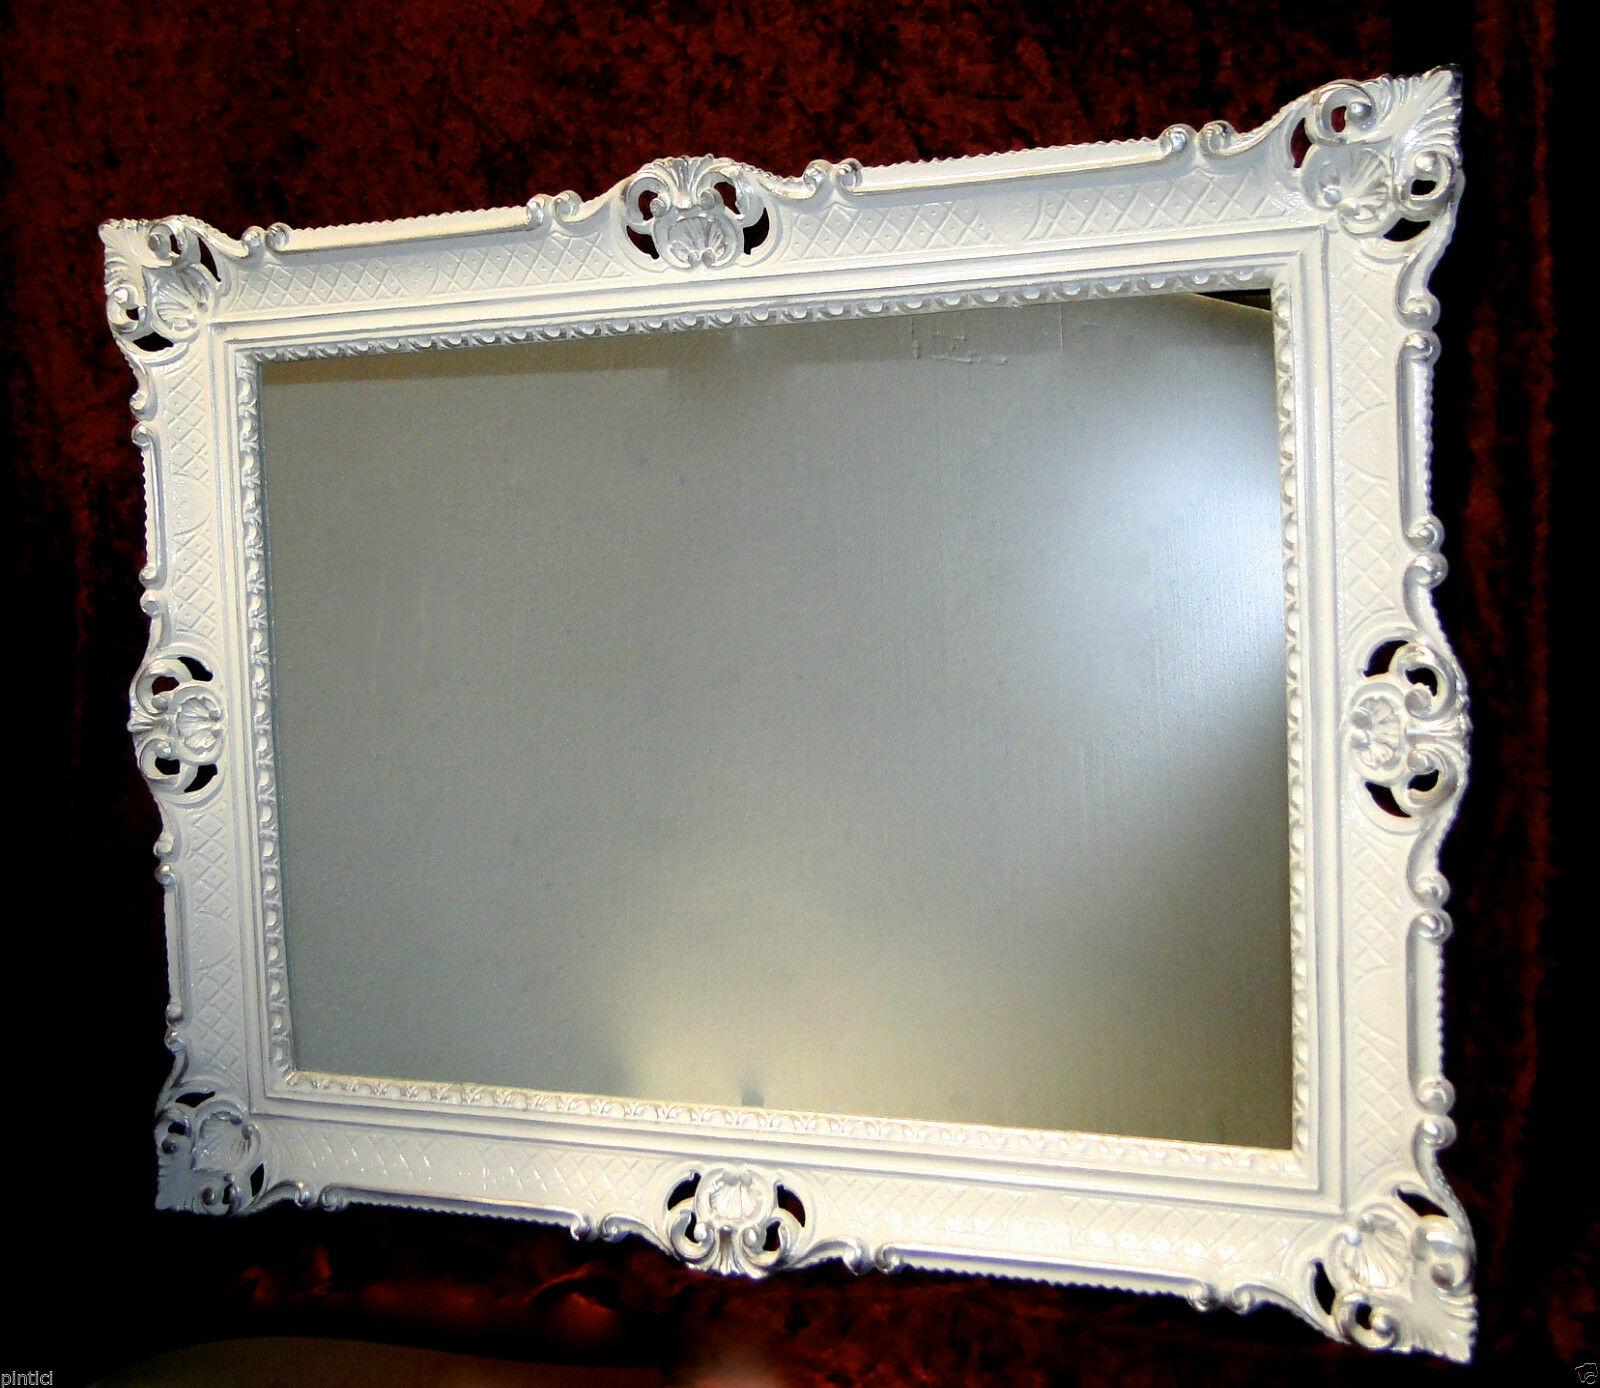 Wandspiegel Barock Großer Spiegel Weiß Silber90x70 Bilderrahmen ...